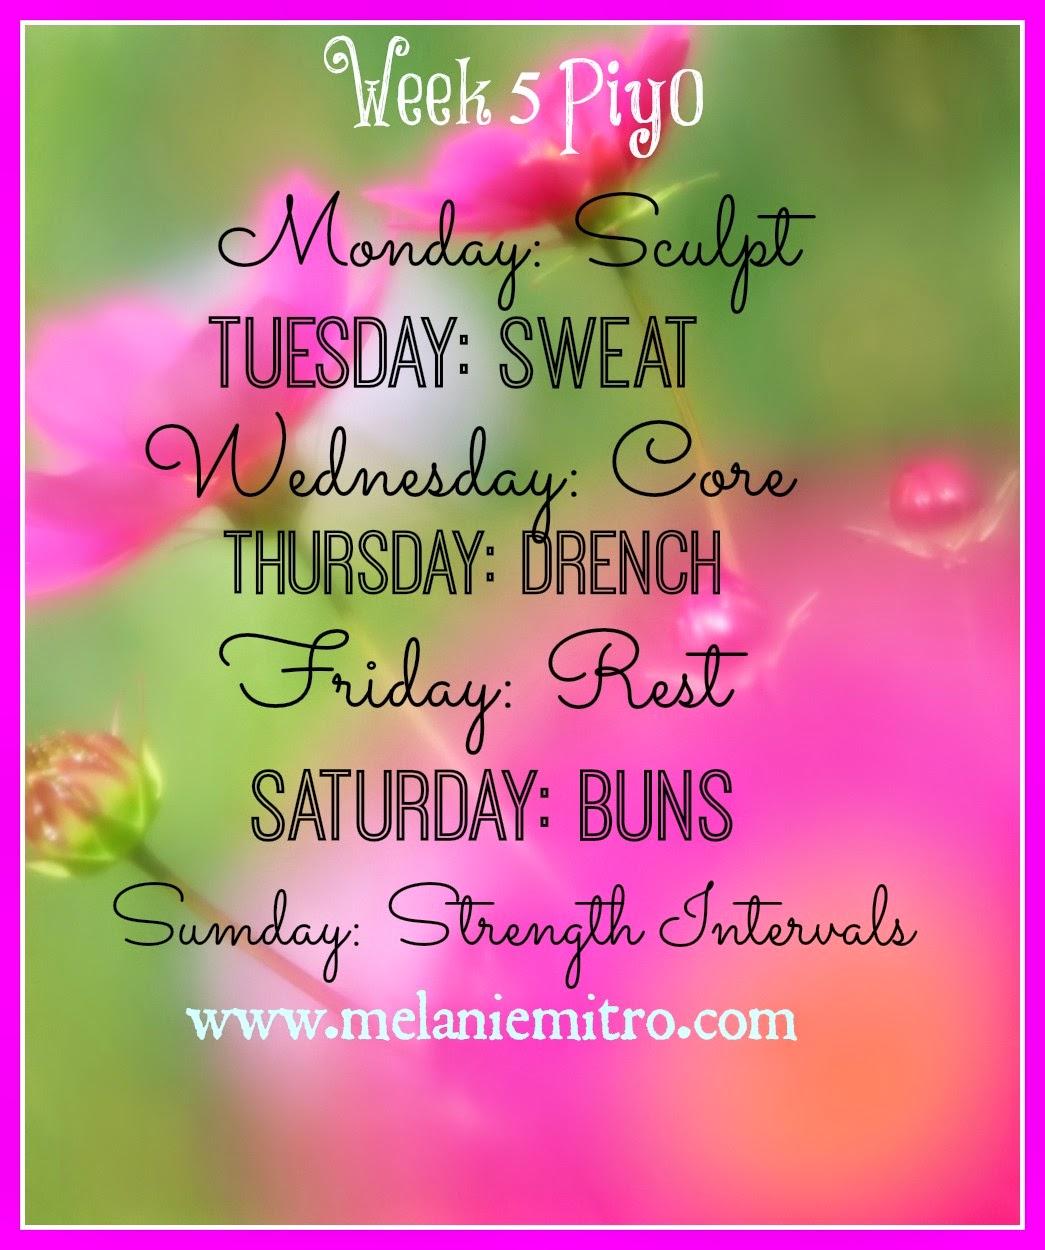 Week 5 Piyo Workout calendar